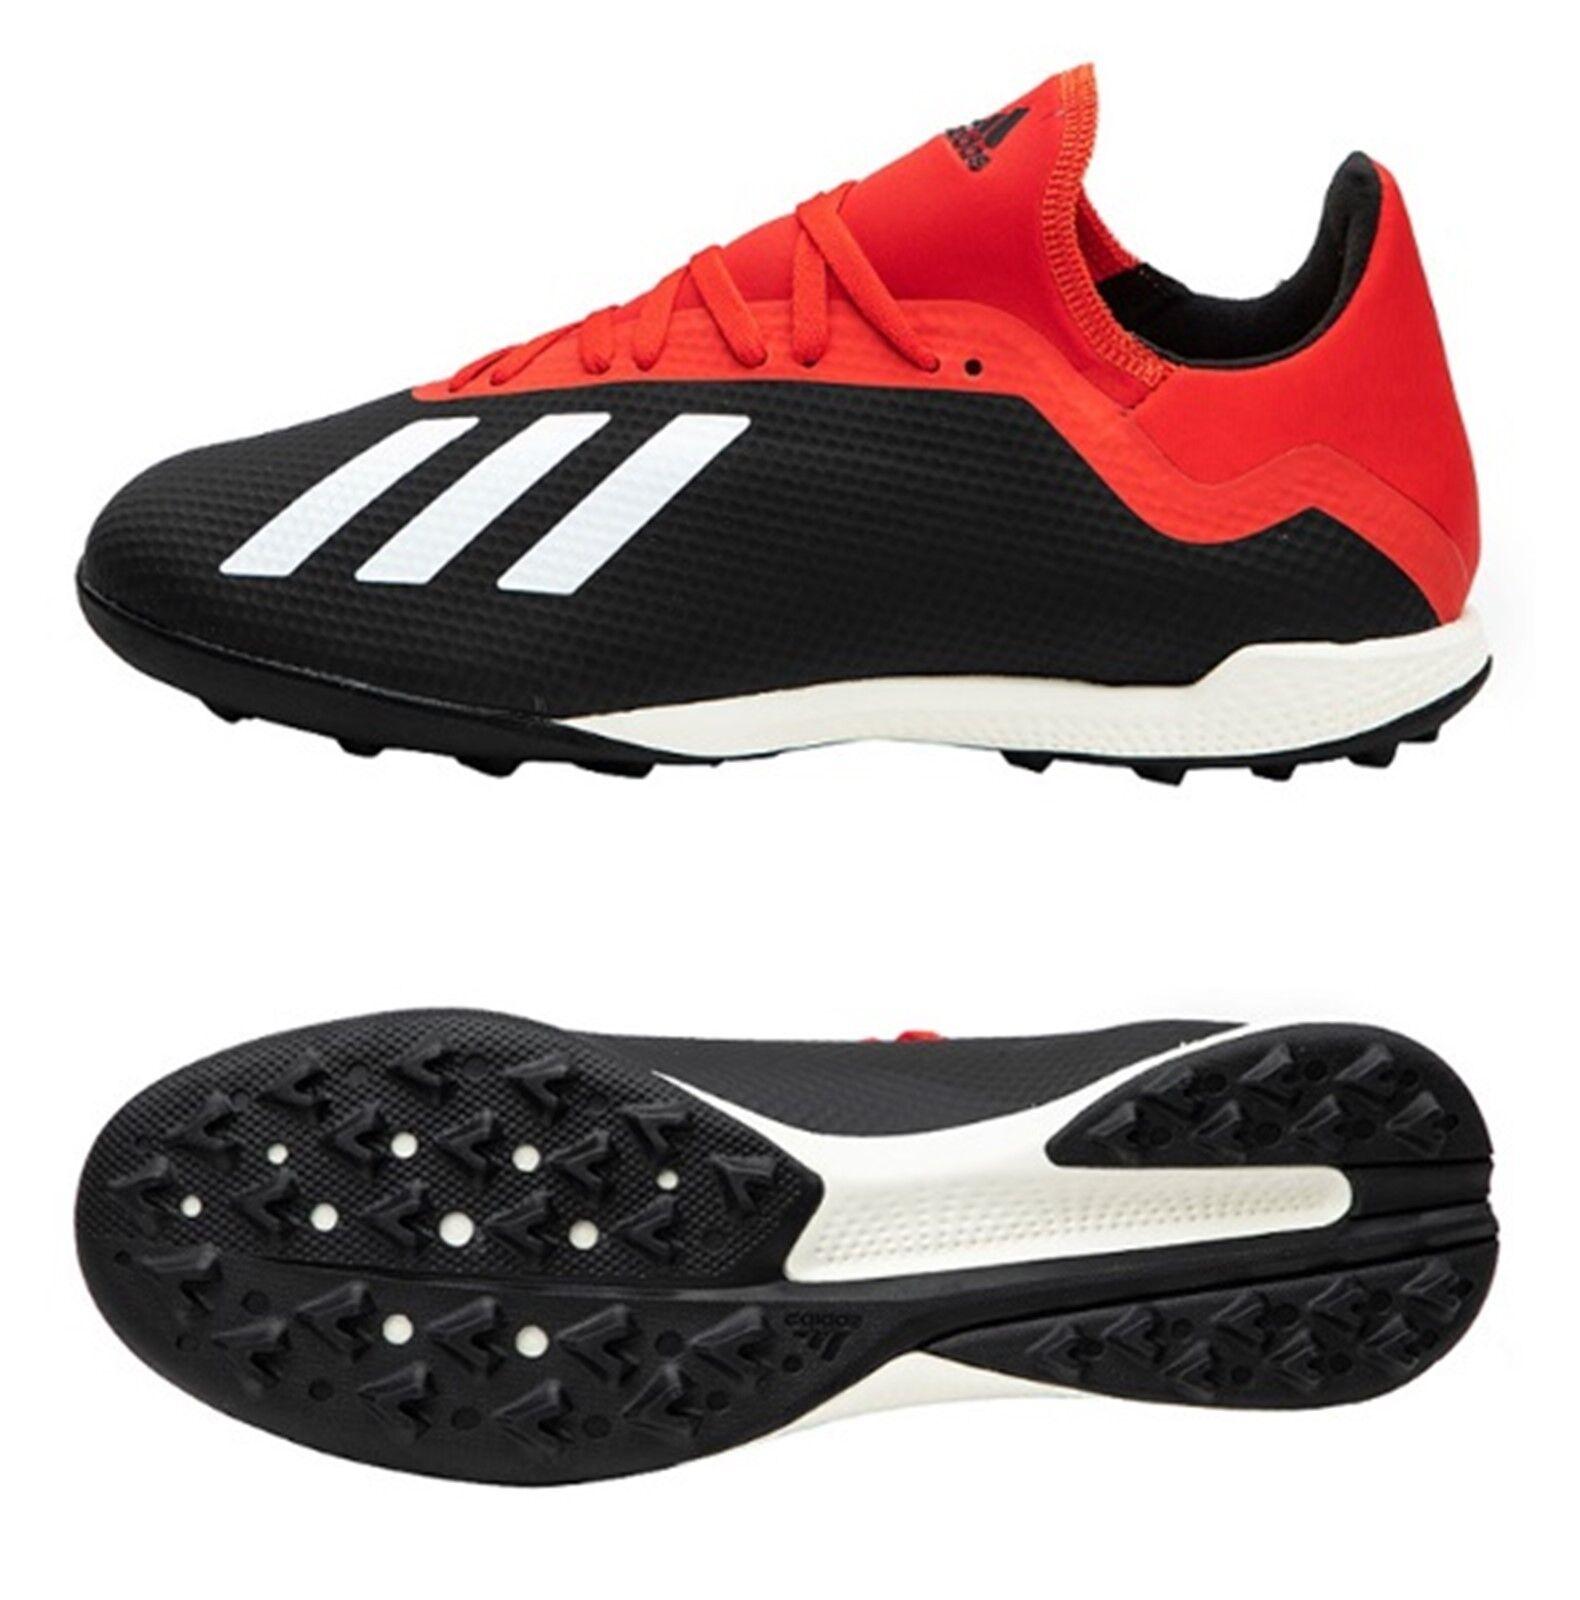 Adidas Hombres X 18.3 Roscada Horquilla Botines Futsal Fútbol Rojo Negro Zapatos botas Spike BB9398